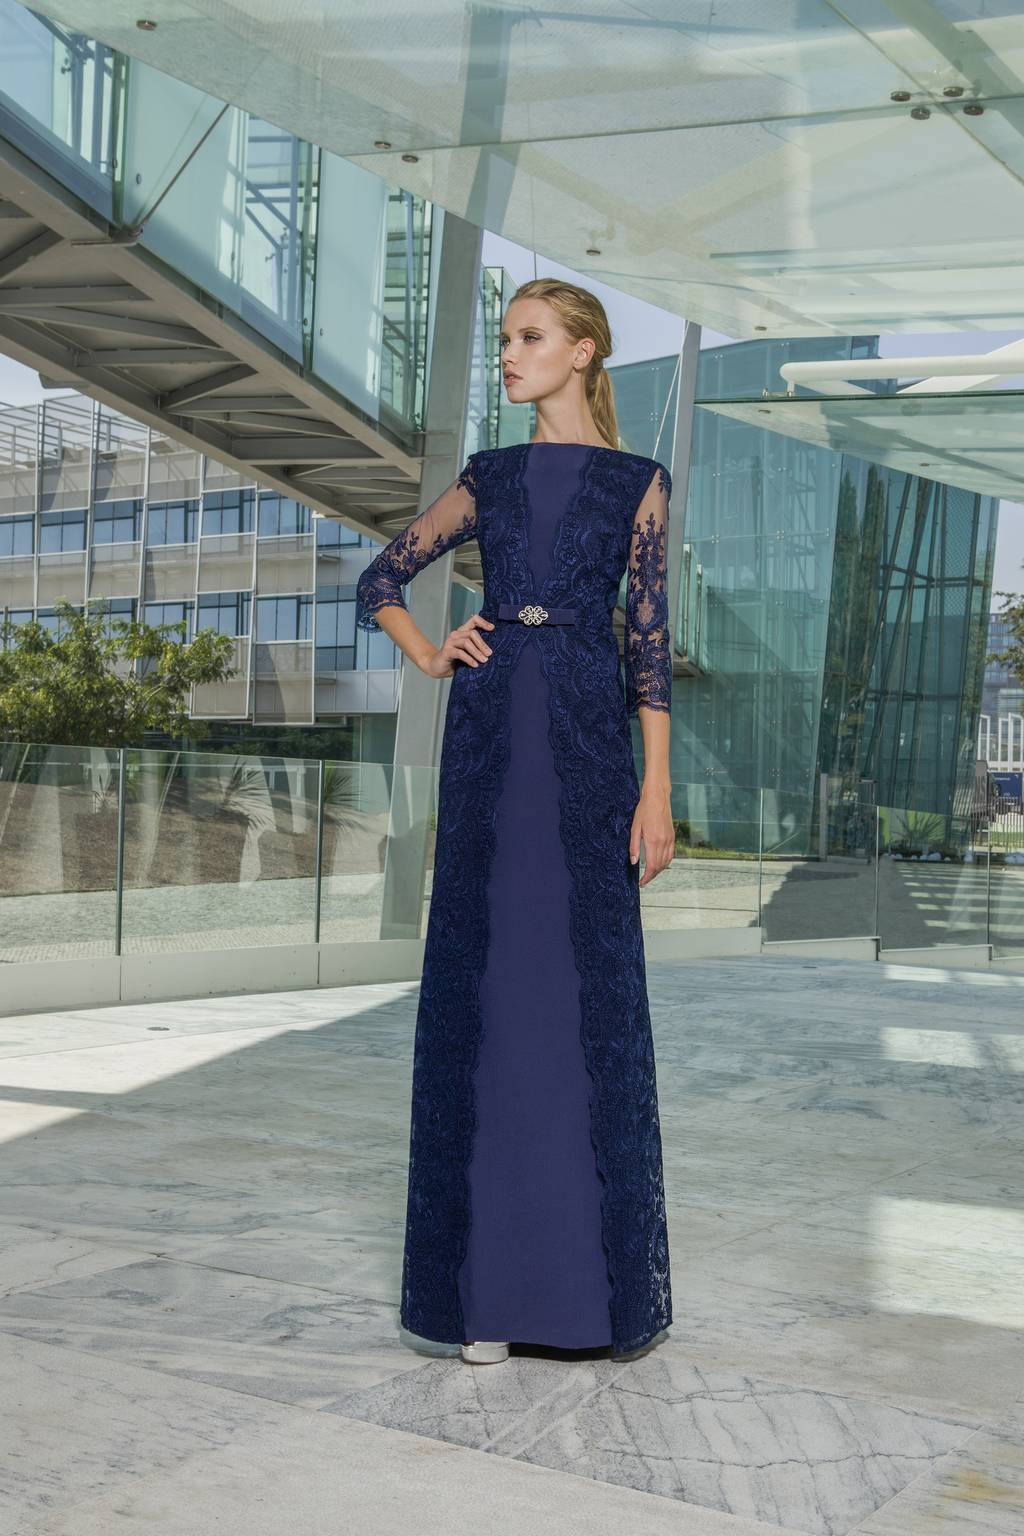 8 Kreativ Abendkleider Neuss Galerie - Abendkleid